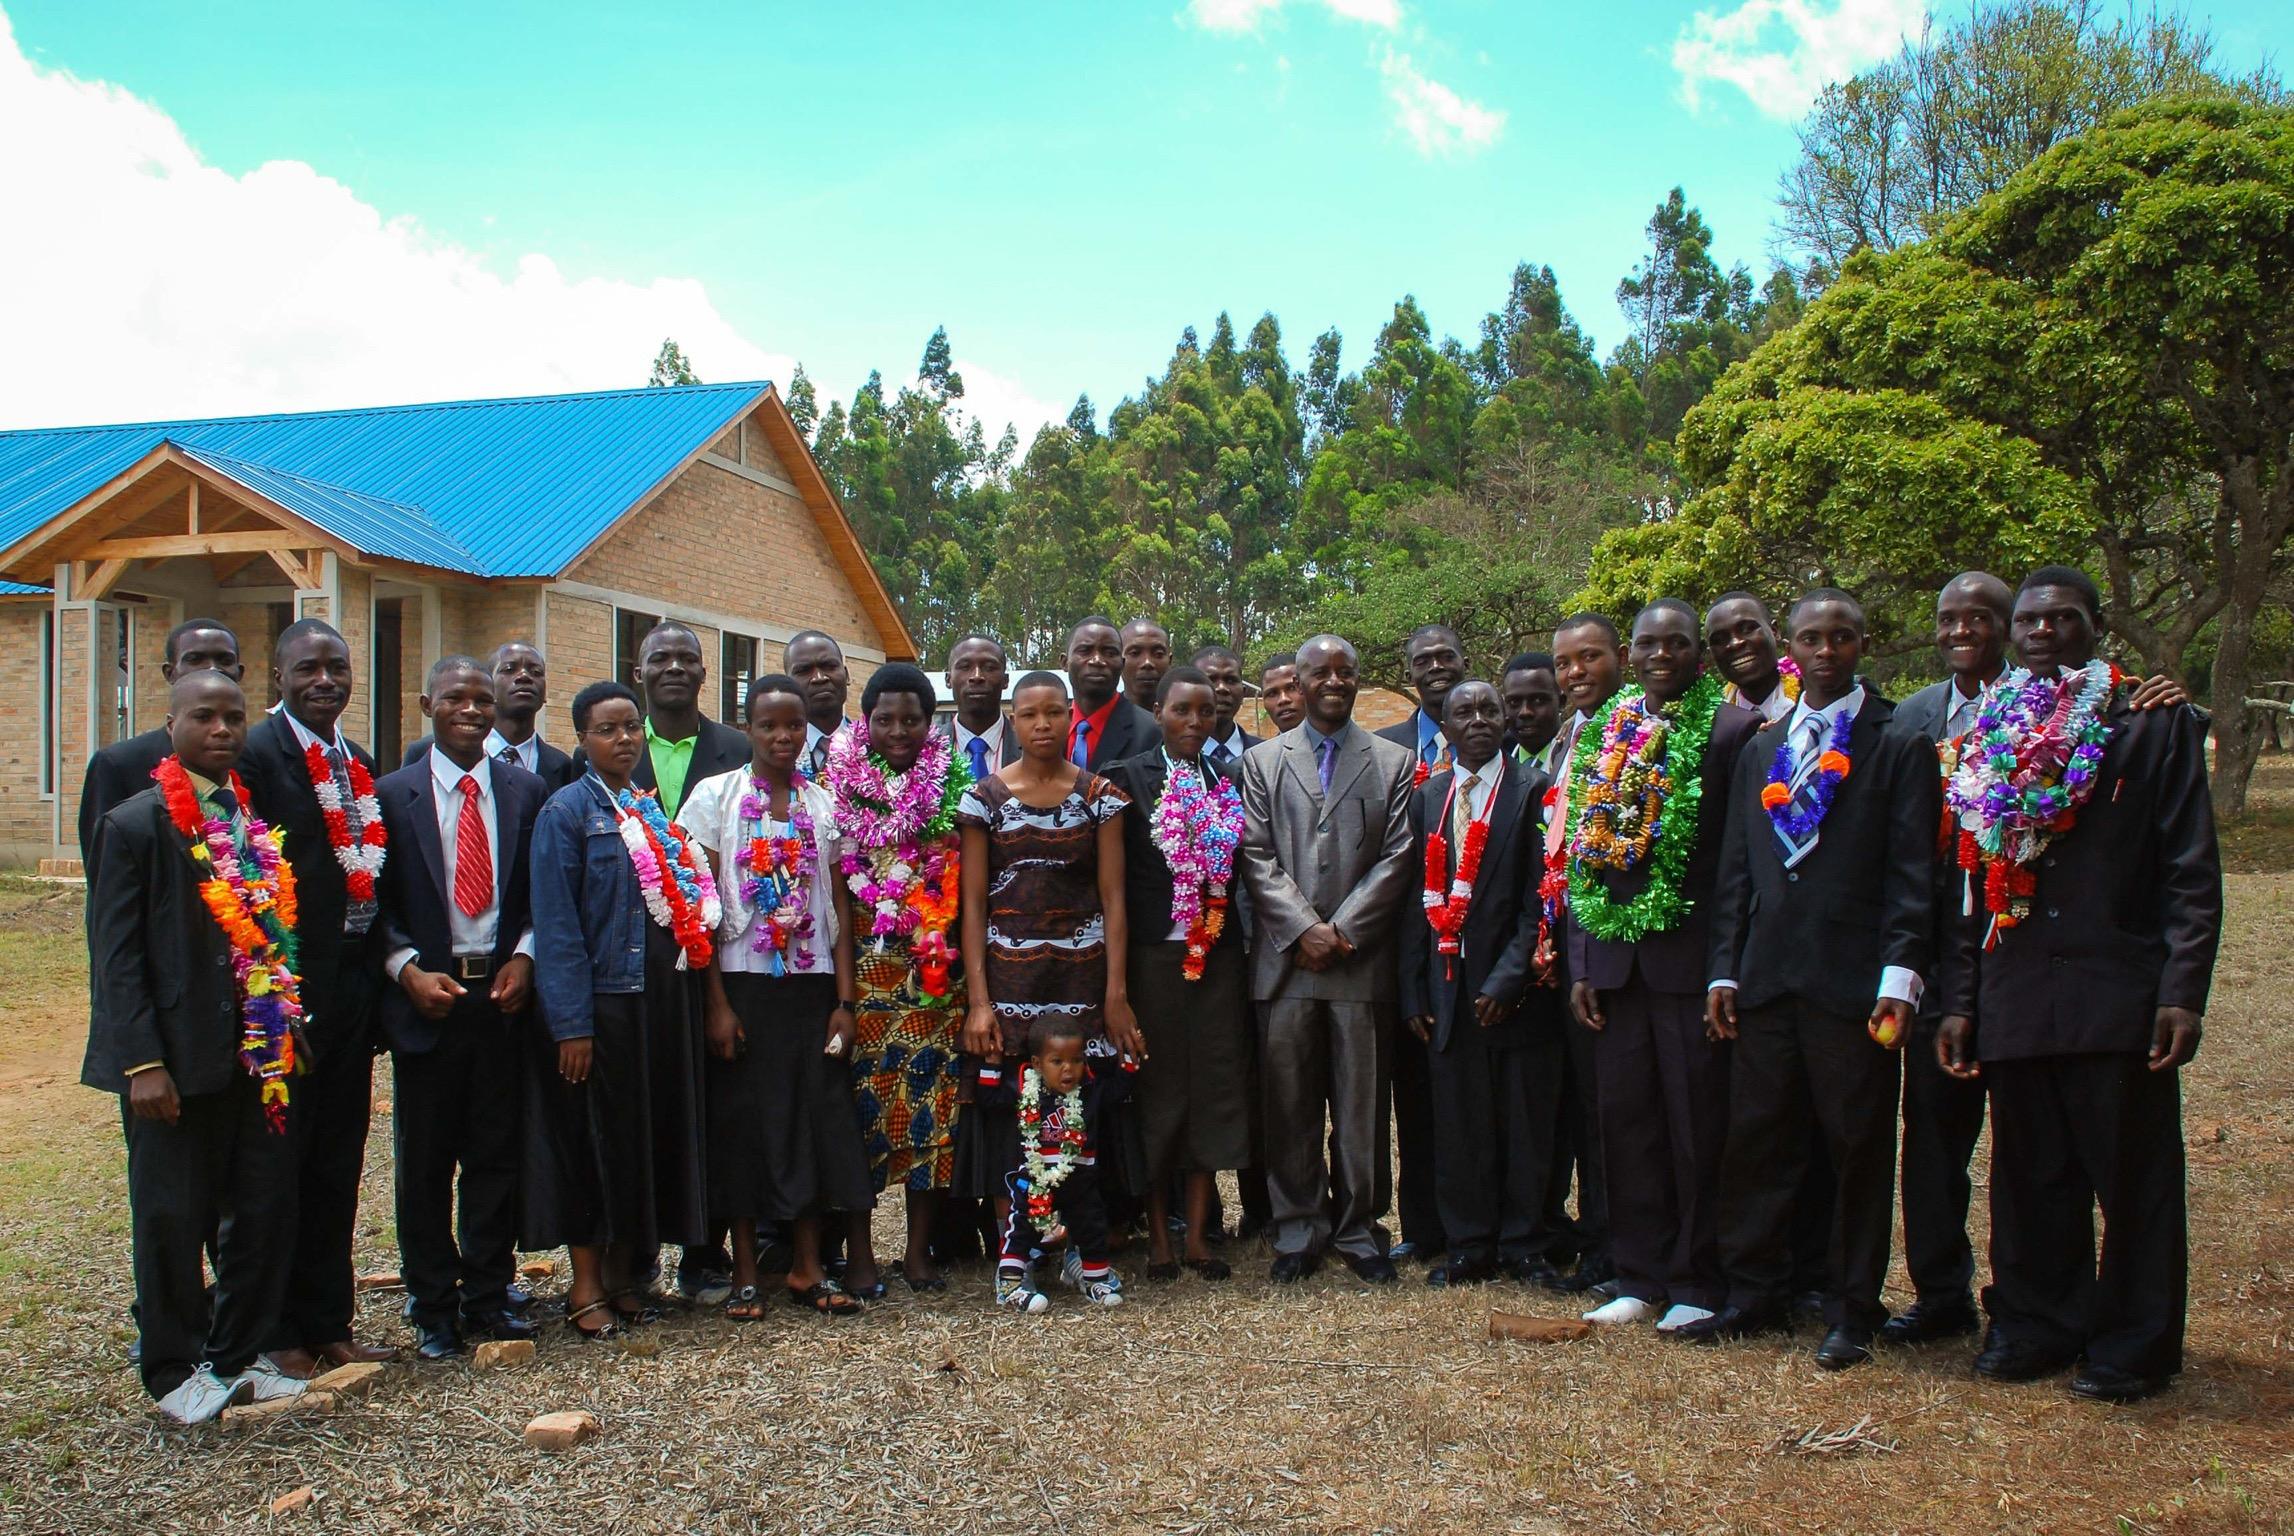 Graduation of Evangelism School Students (Session 2, 2014)